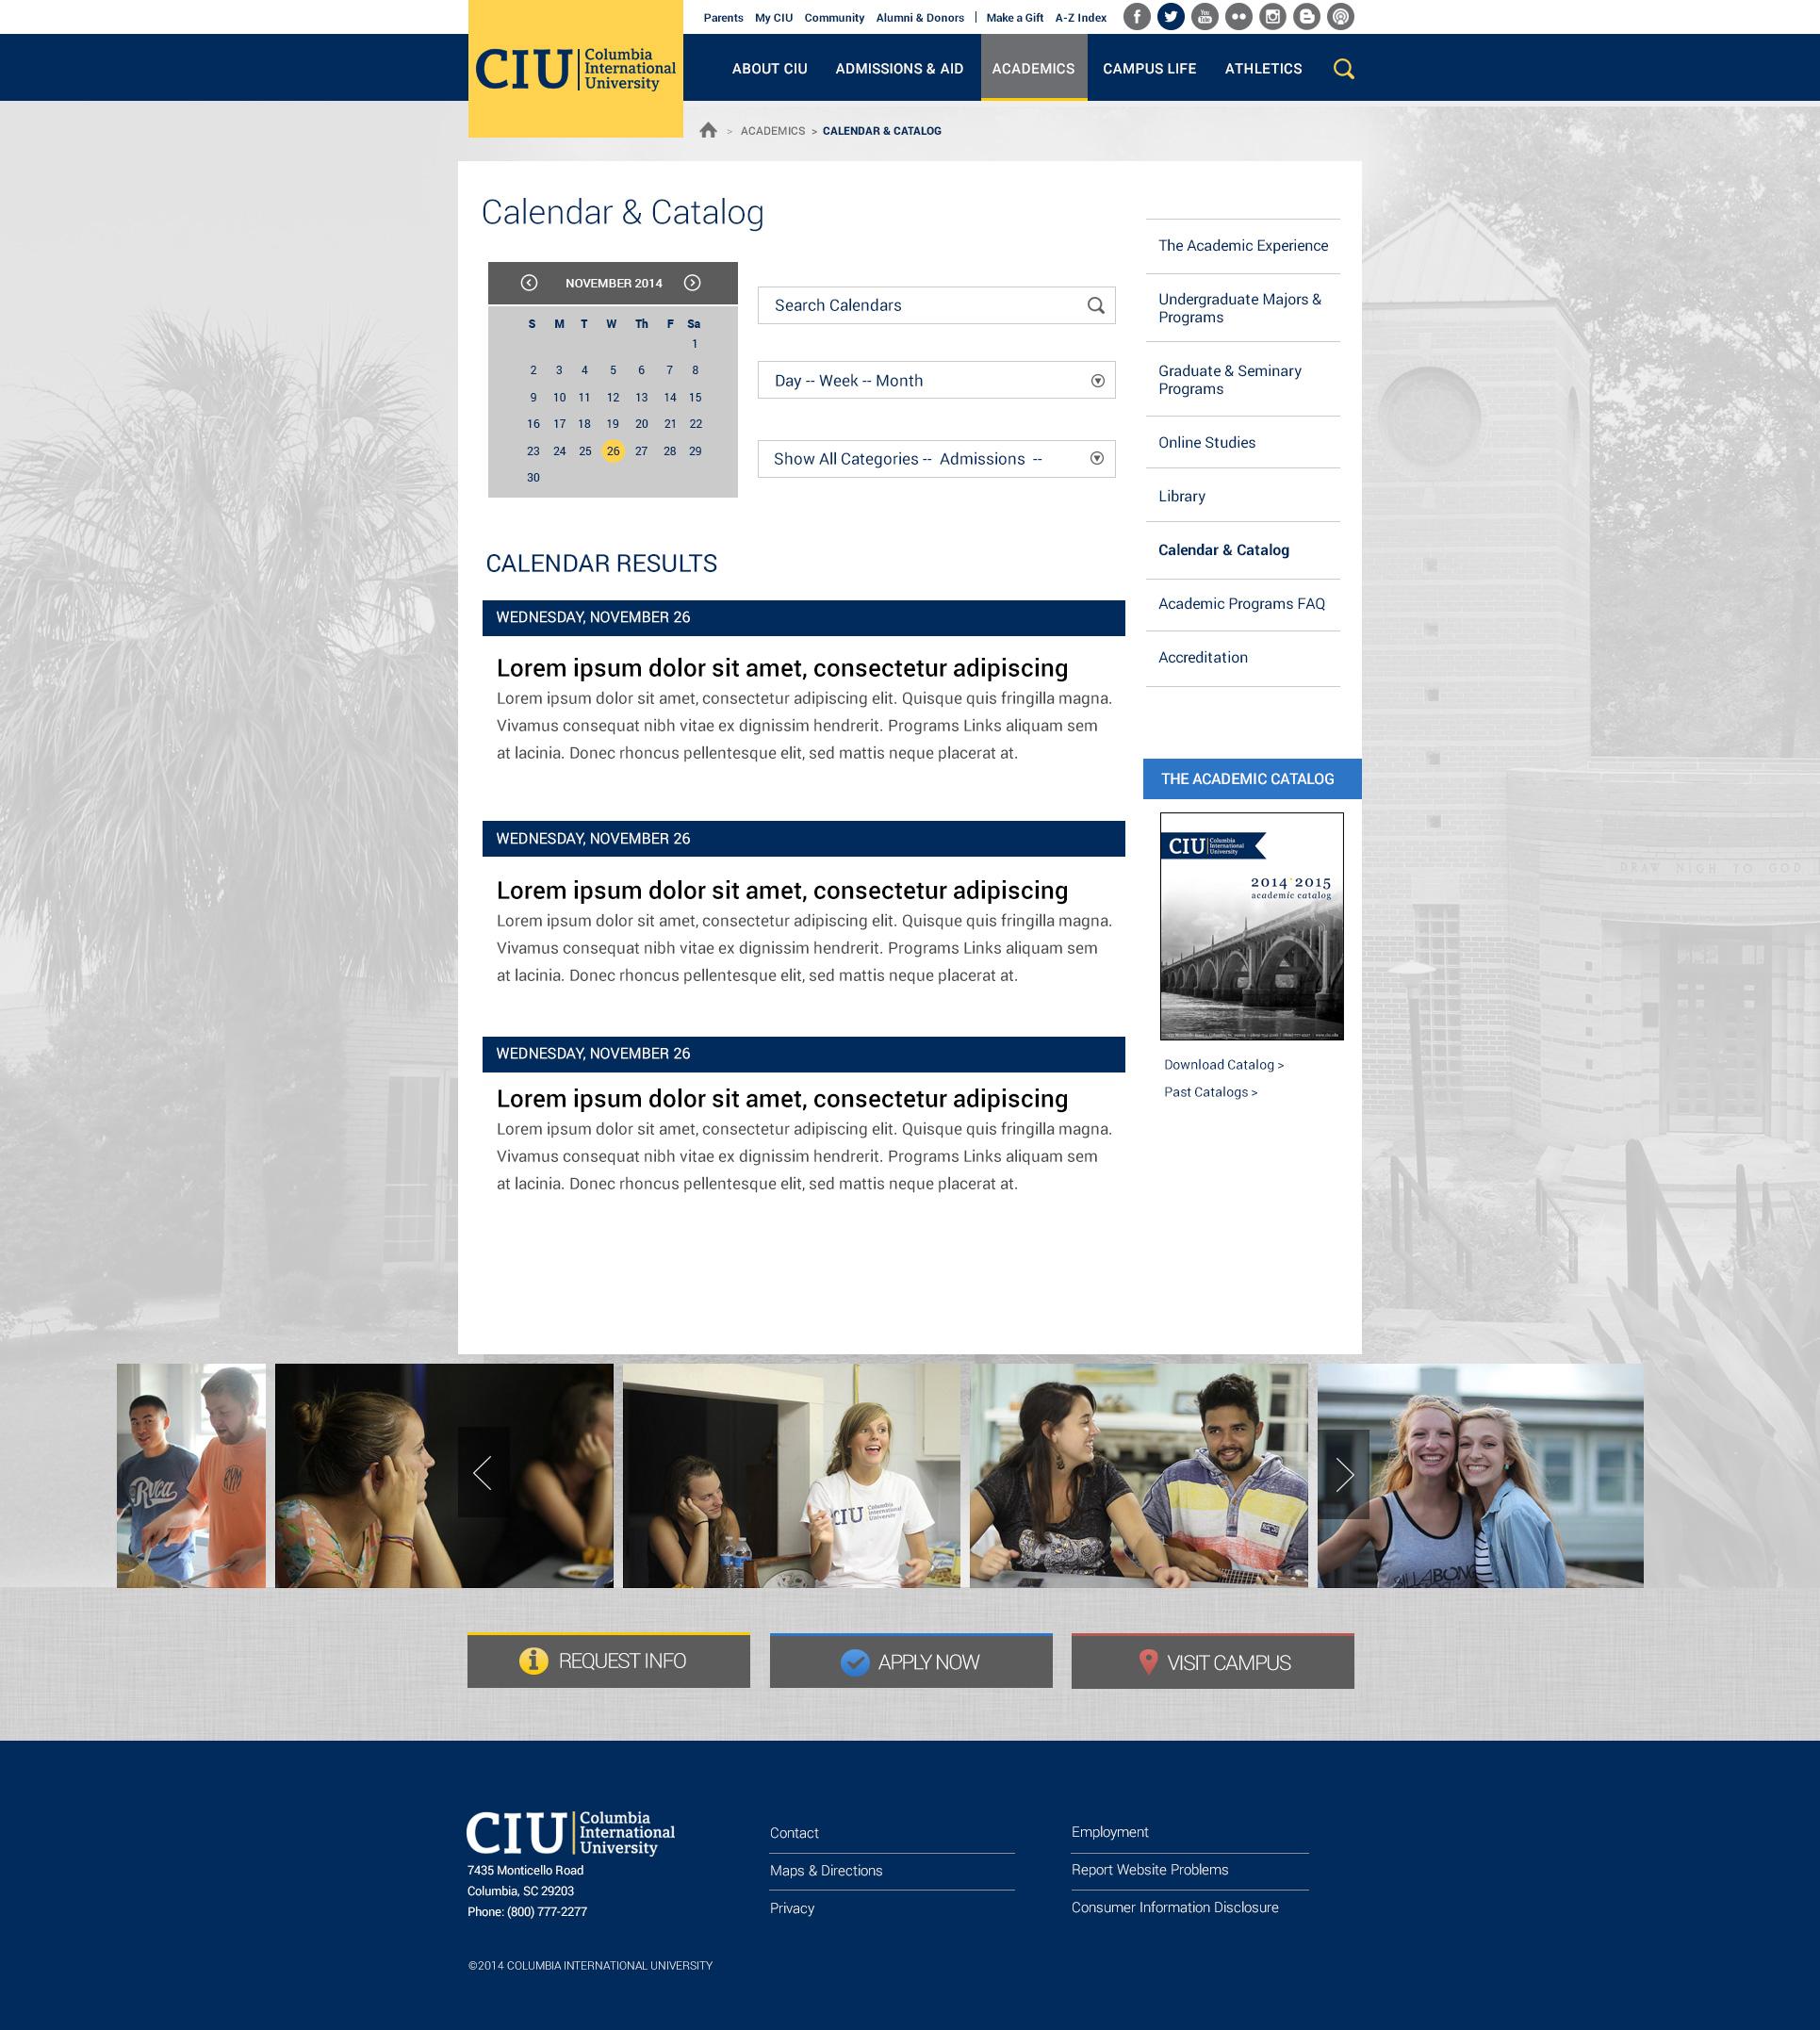 CIU-Calendar-960